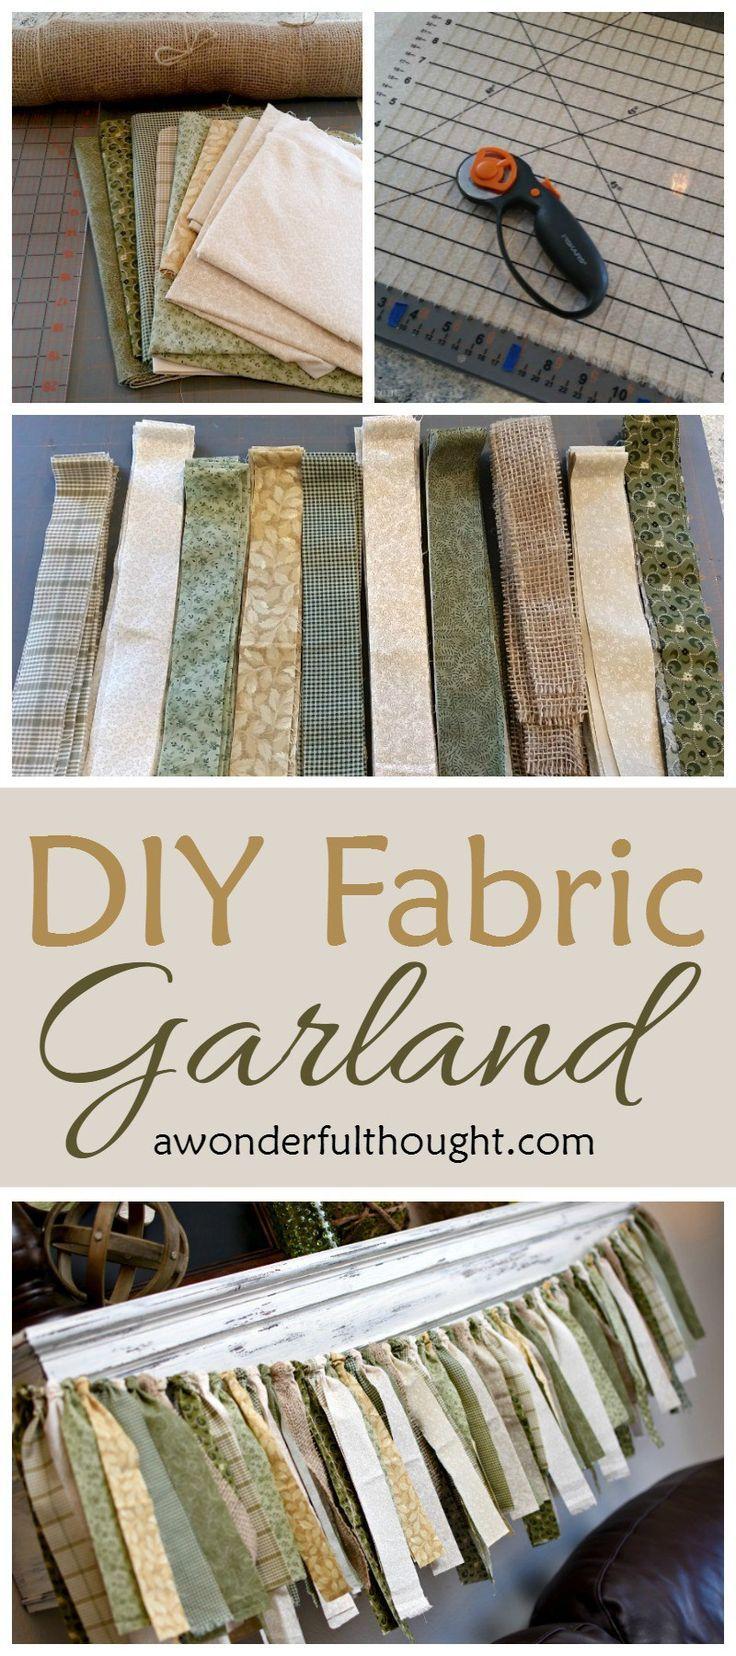 DIY Fabric Garland | awonderfulthought.com